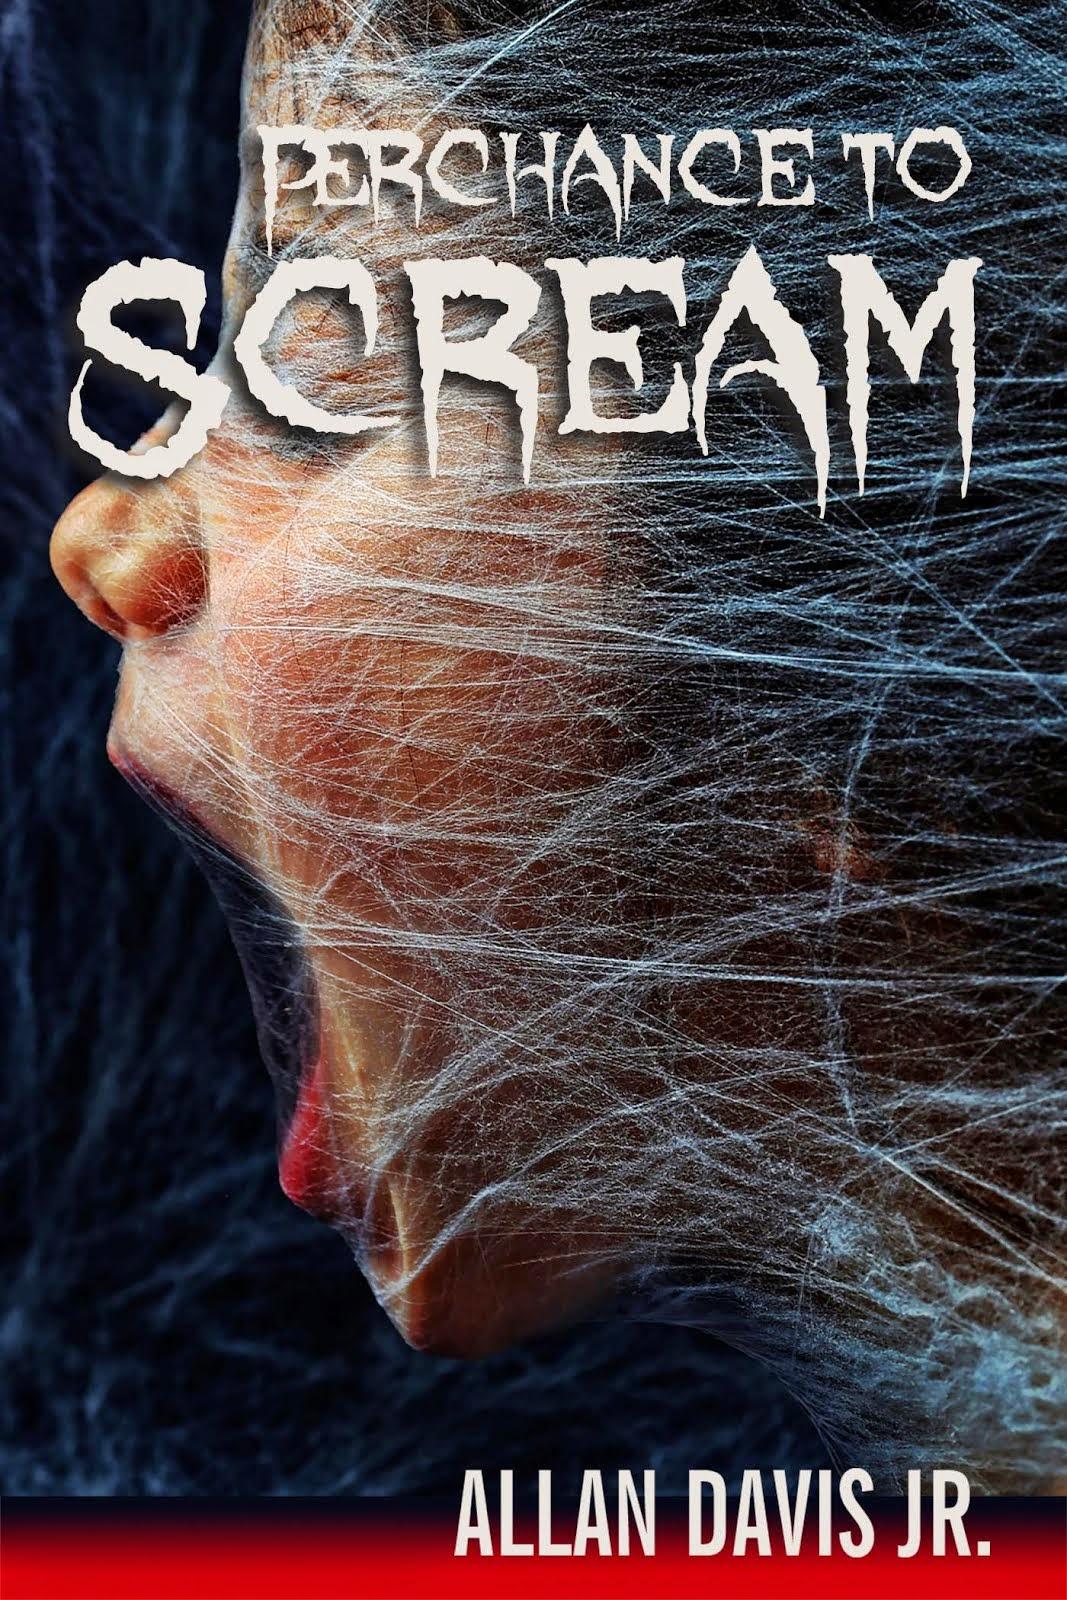 Perchance to Scream